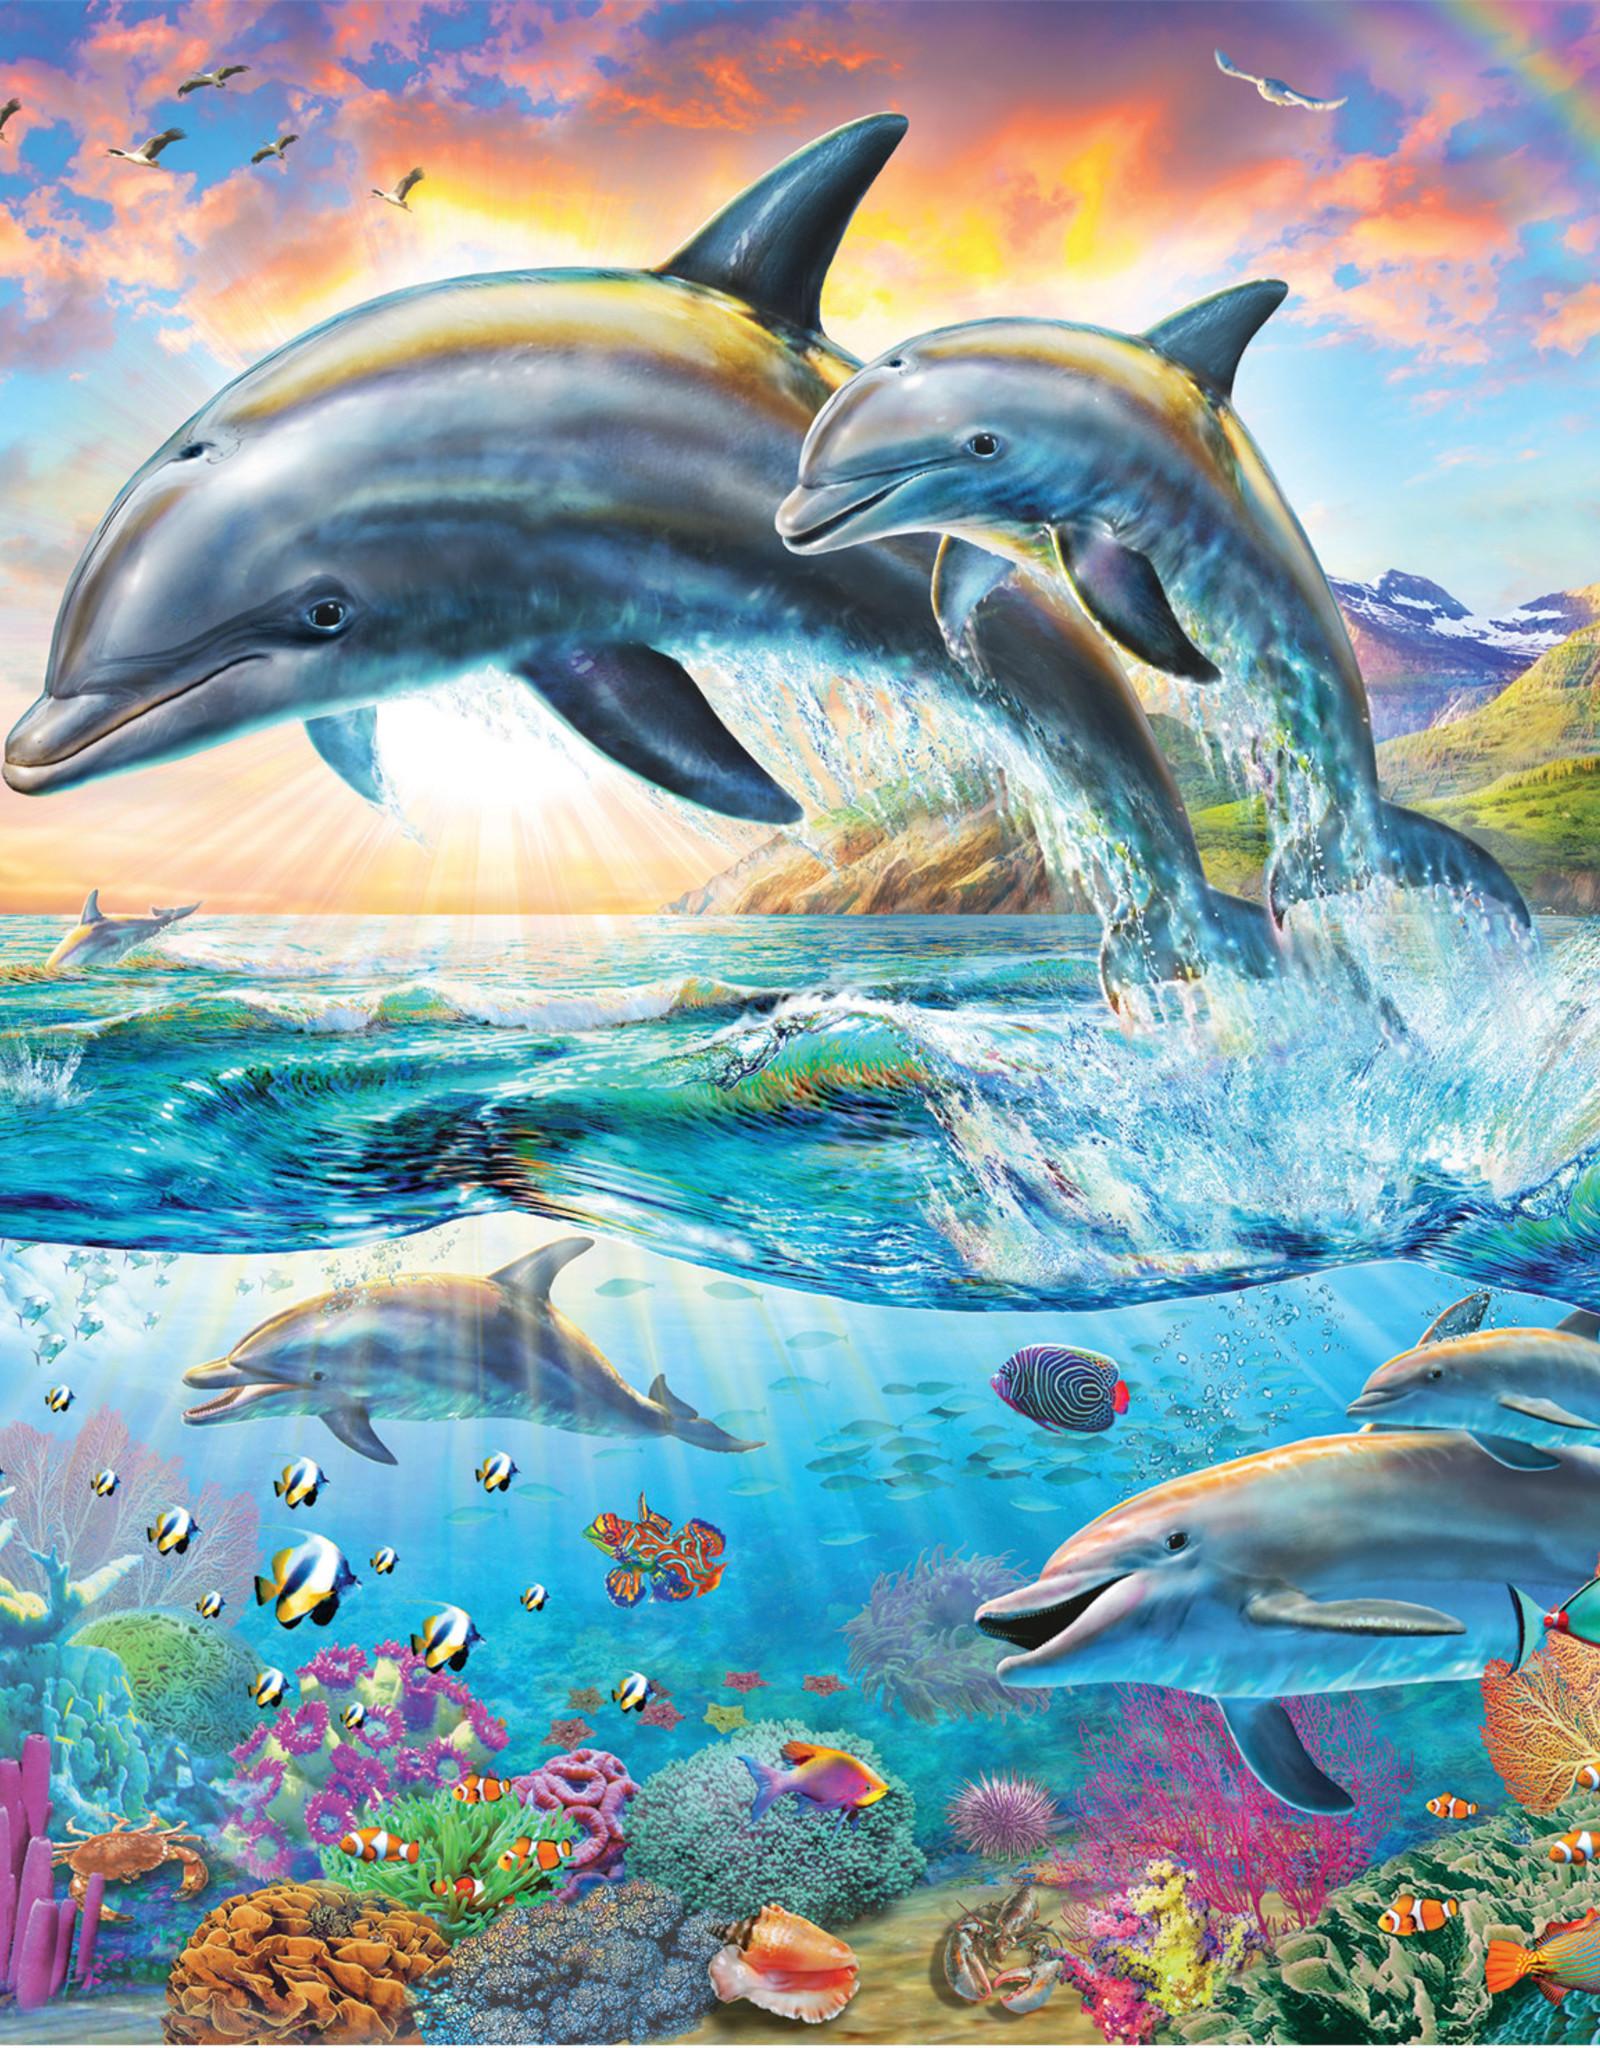 Ravensburger Vibrant Dolphins 100pc Puzzle + Coloring Booklet